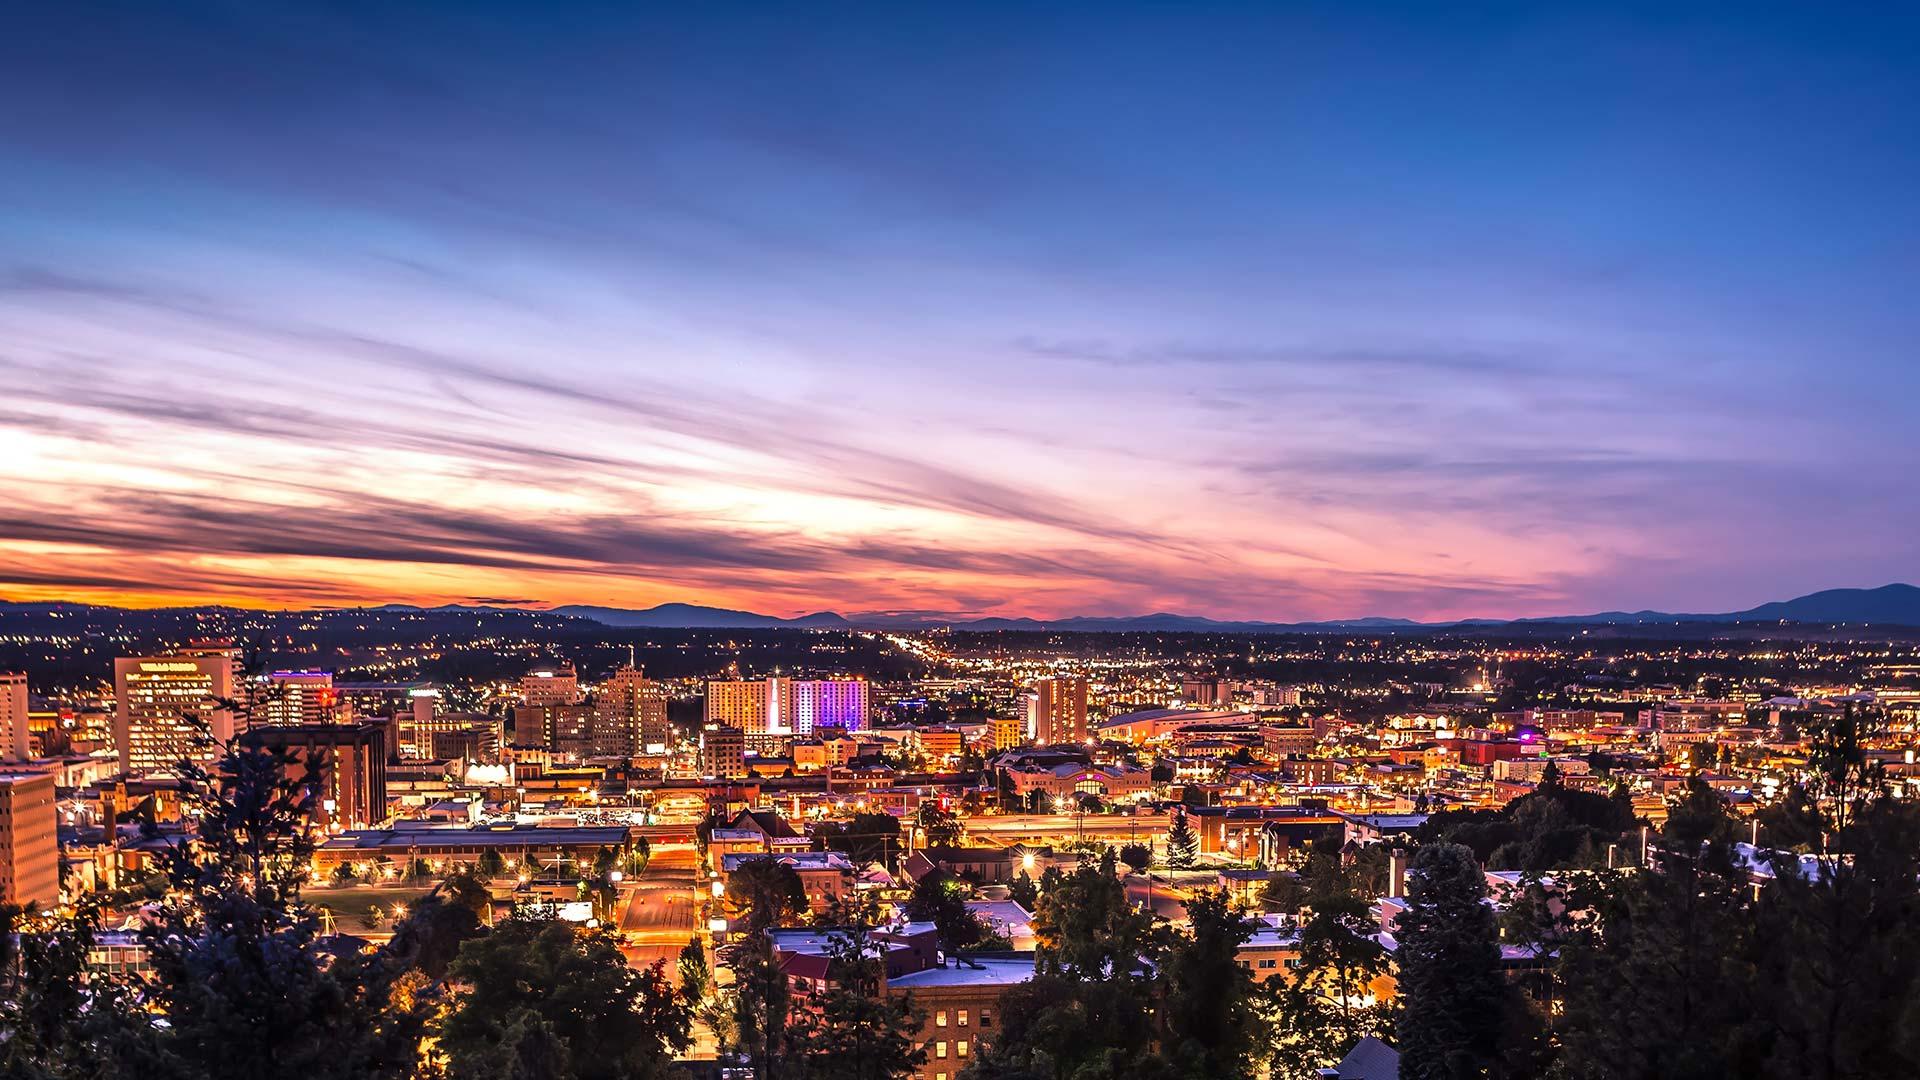 Panorama to illustrate dating in spokane